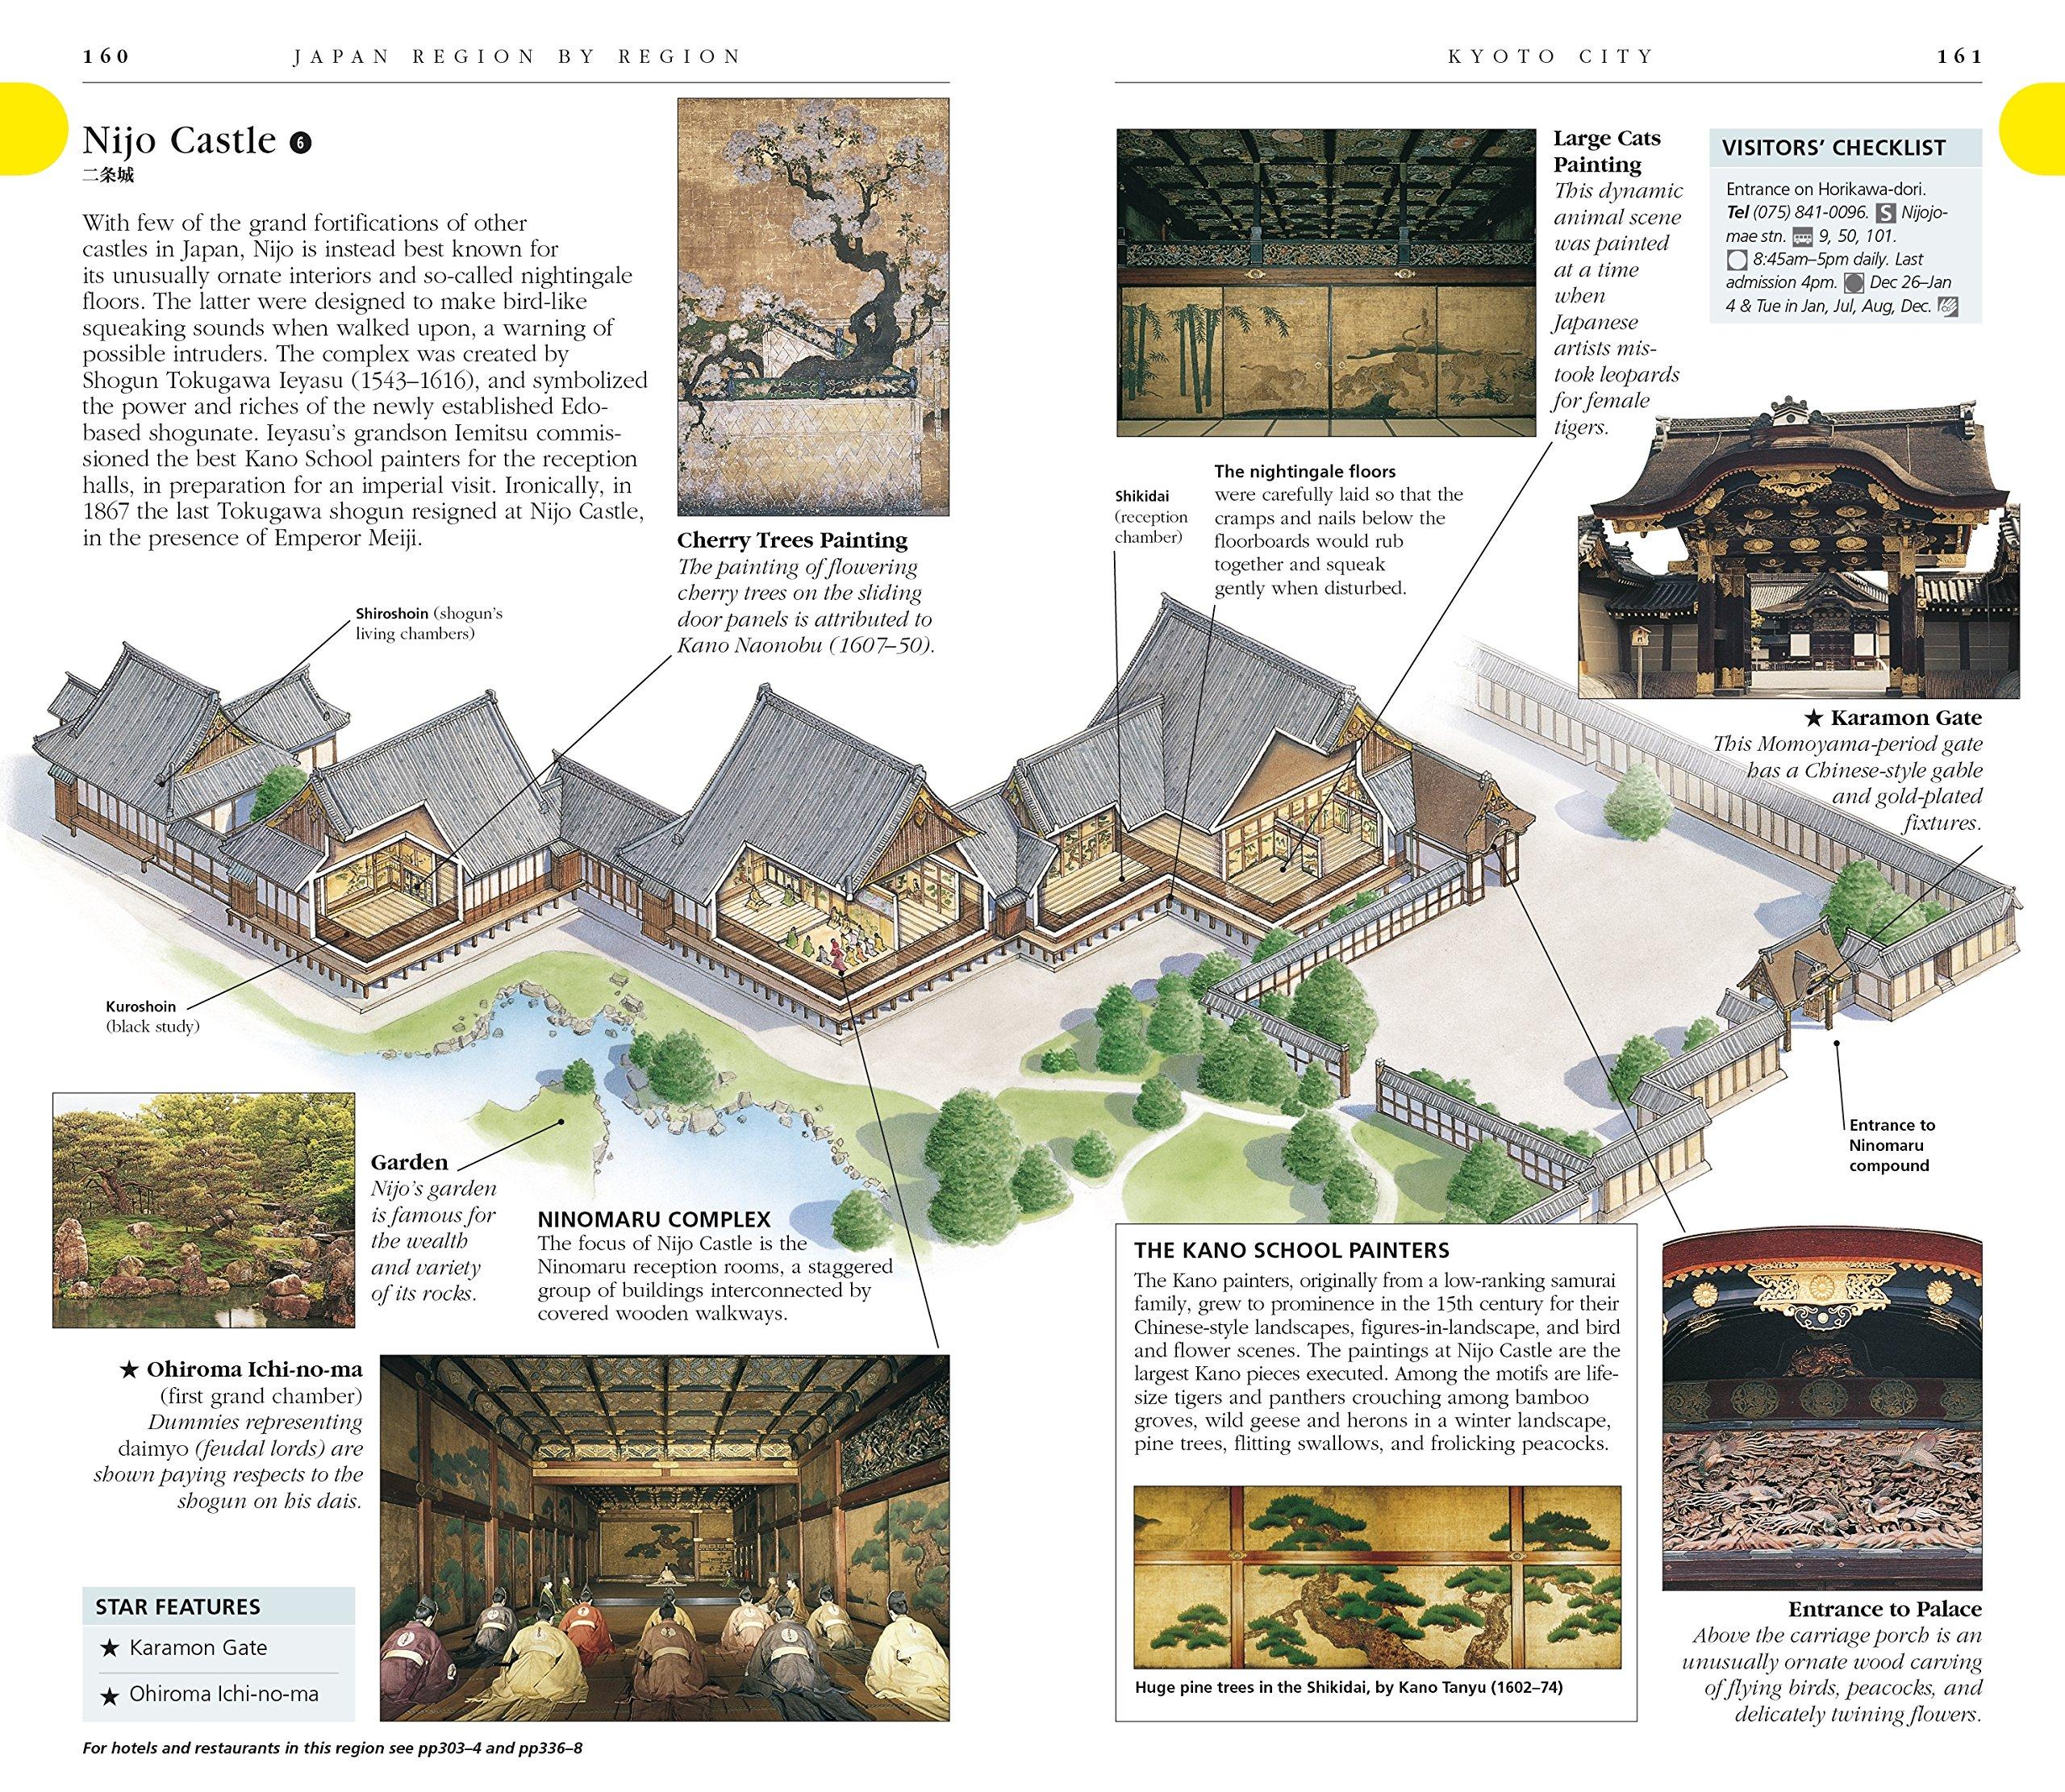 DK Eyewitness Travel Guide: Japan: John Benson: 9780756694739: Amazon.com:  Books